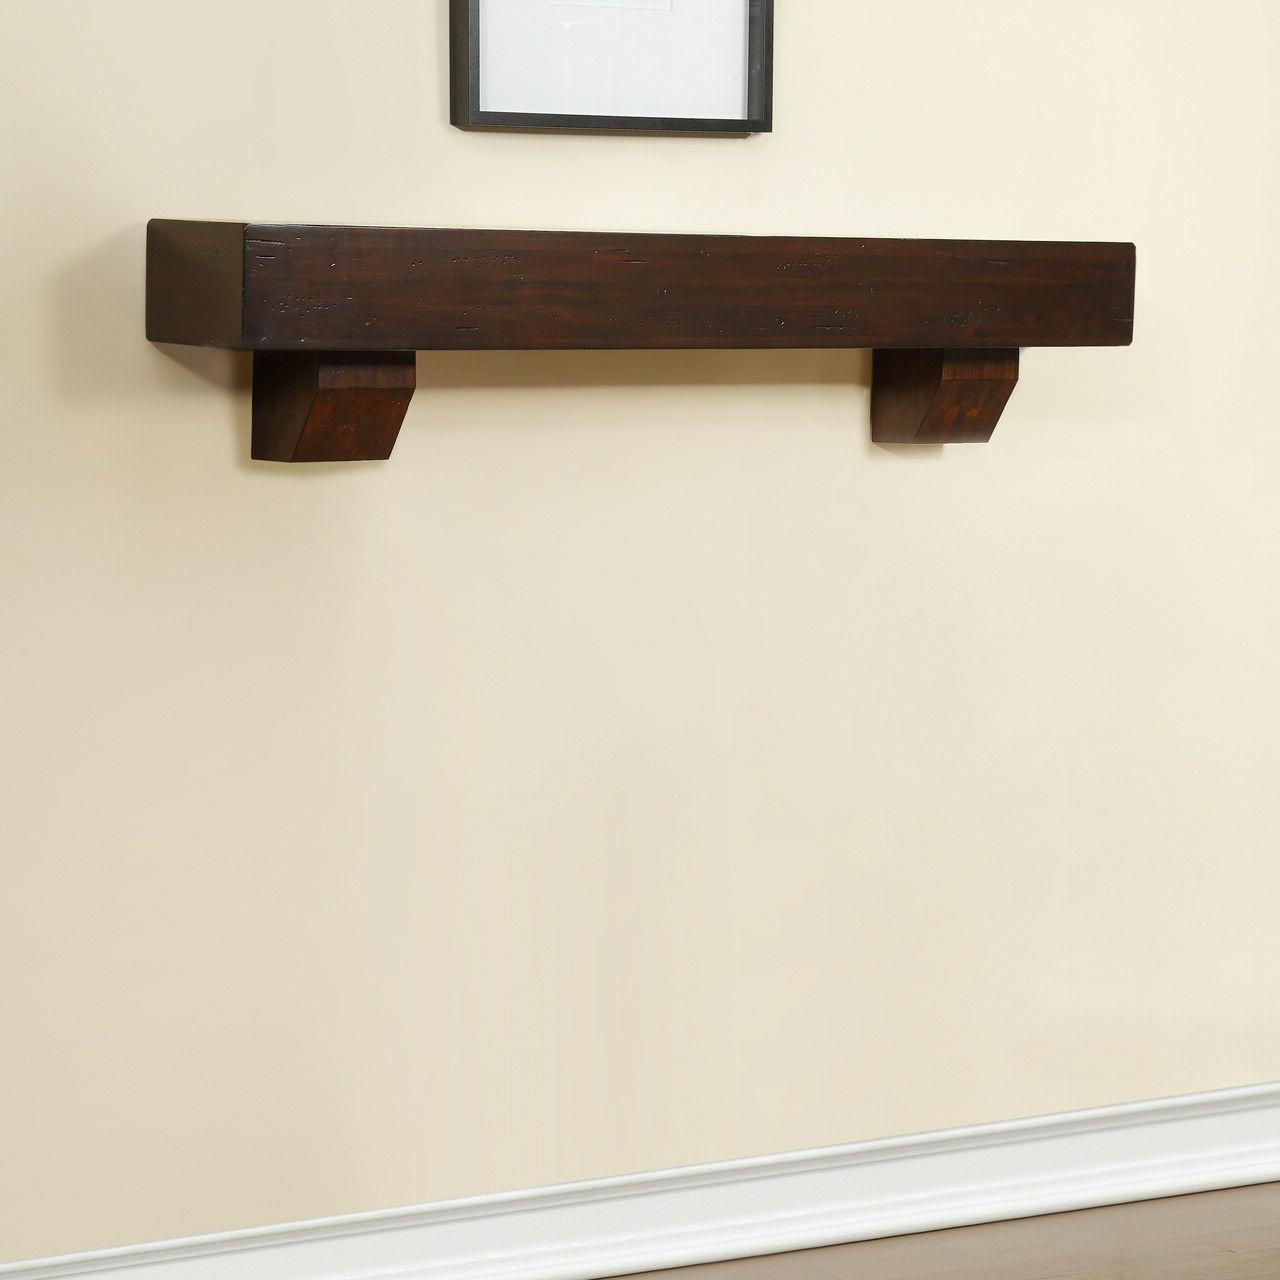 Duluth Fireplace Shelf Mantel Corbels - Chocolate Finish